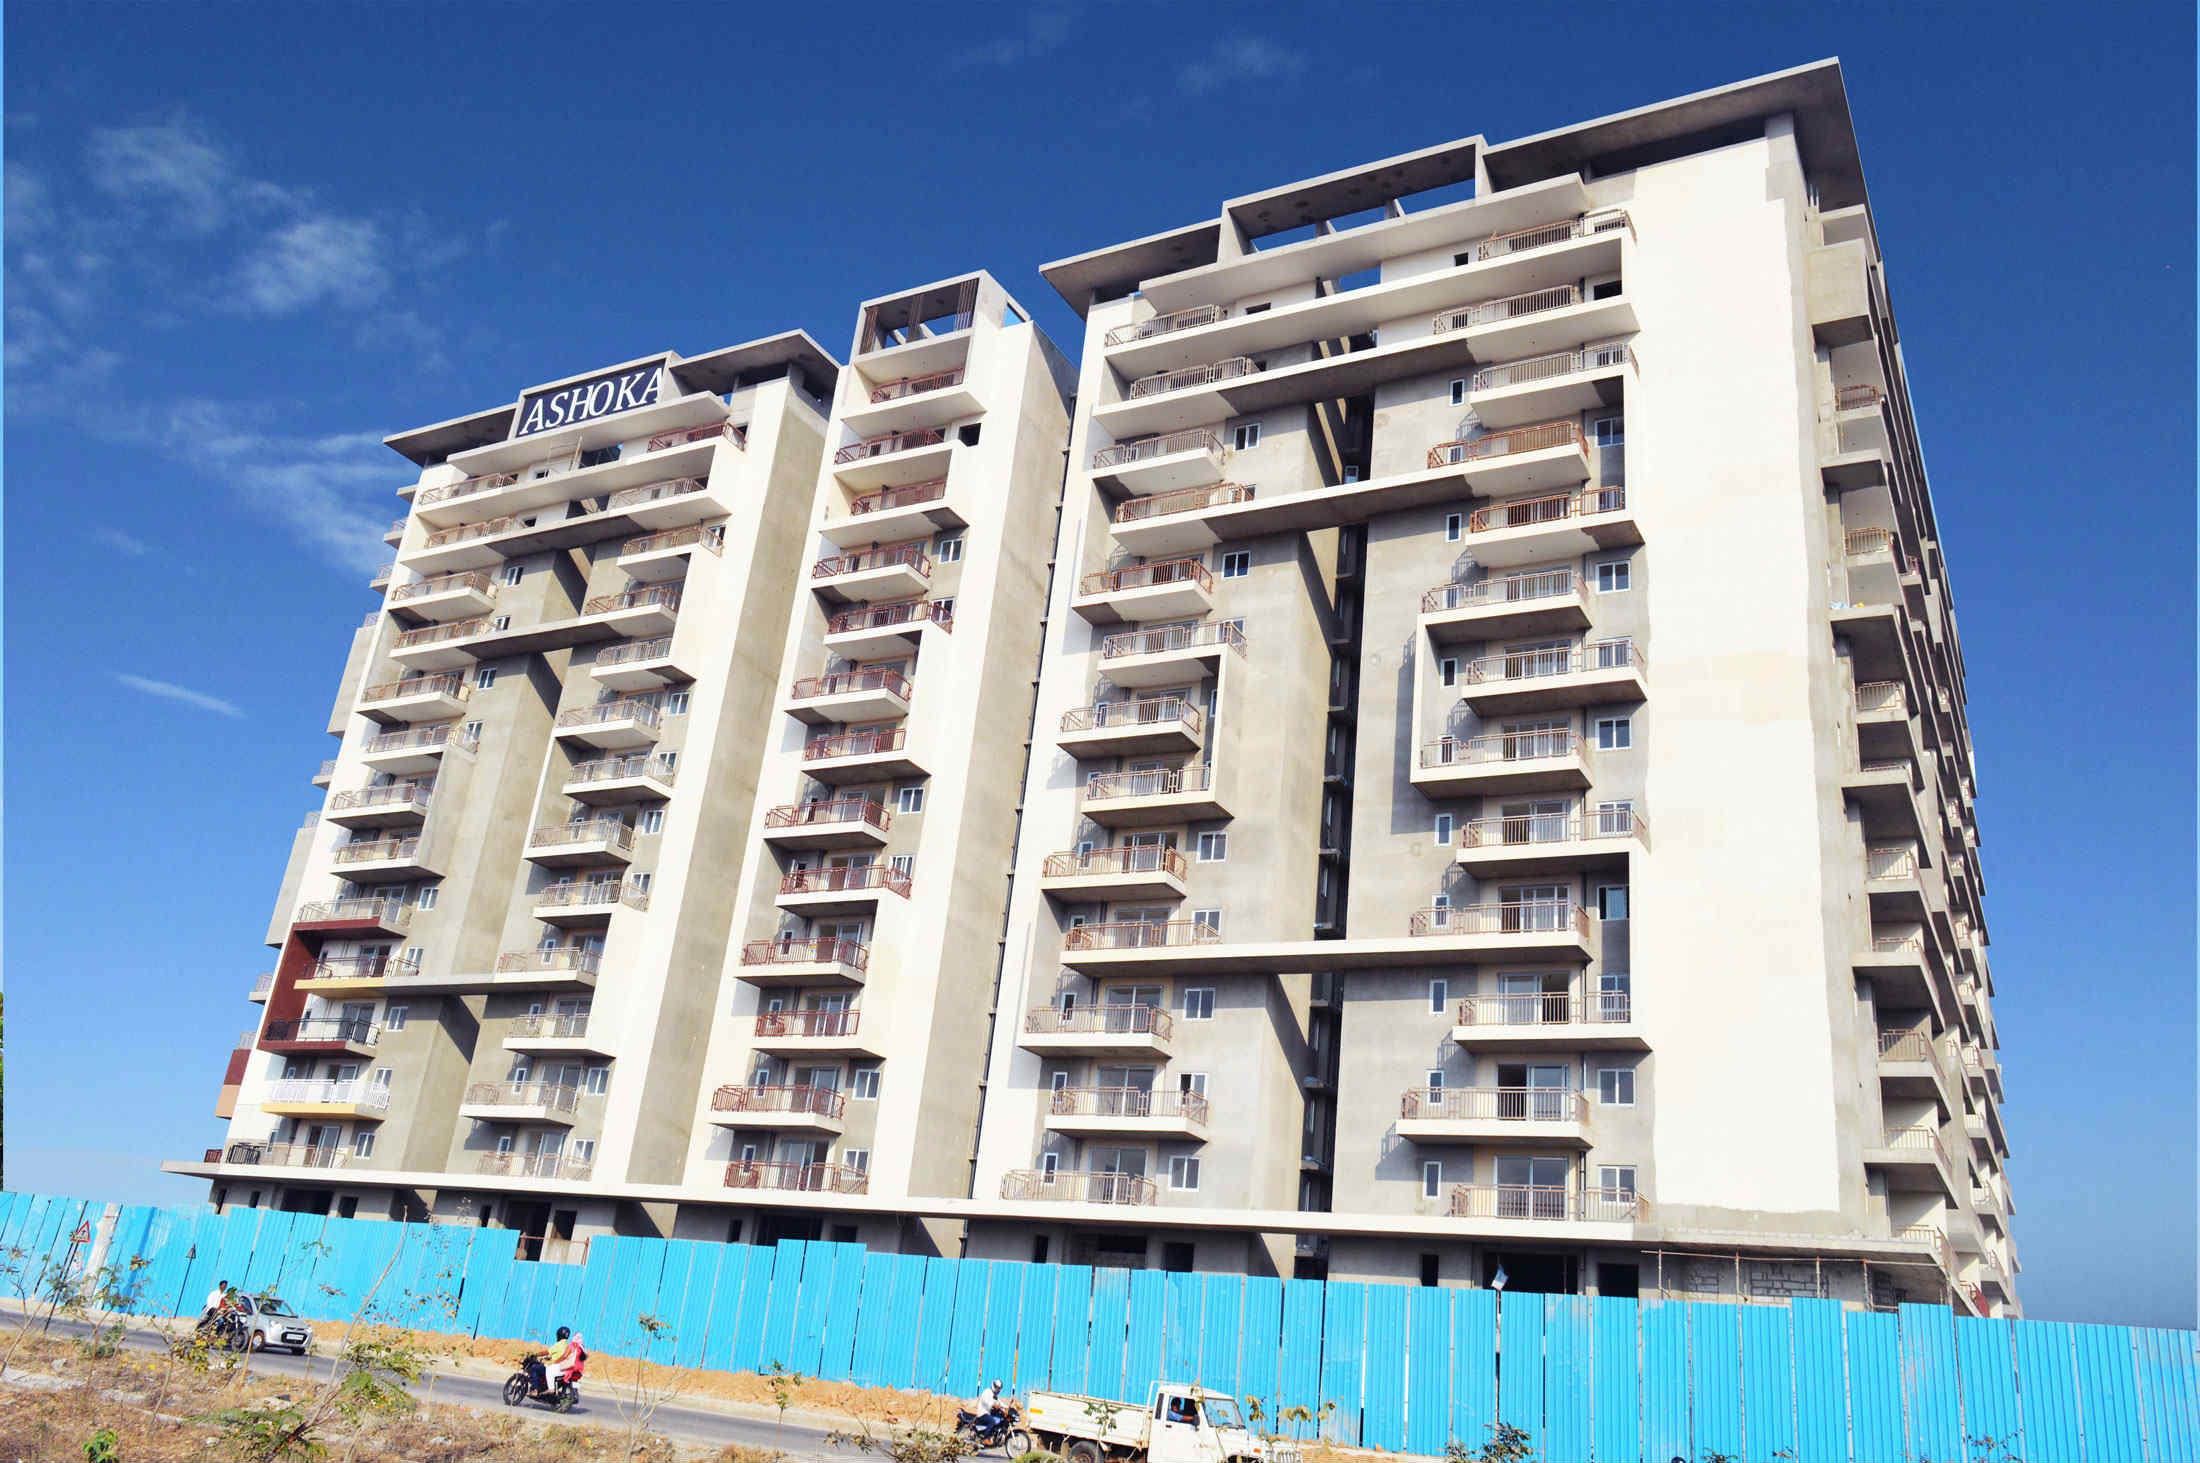 ashoka liviano builders in hyderabad luxury apartment